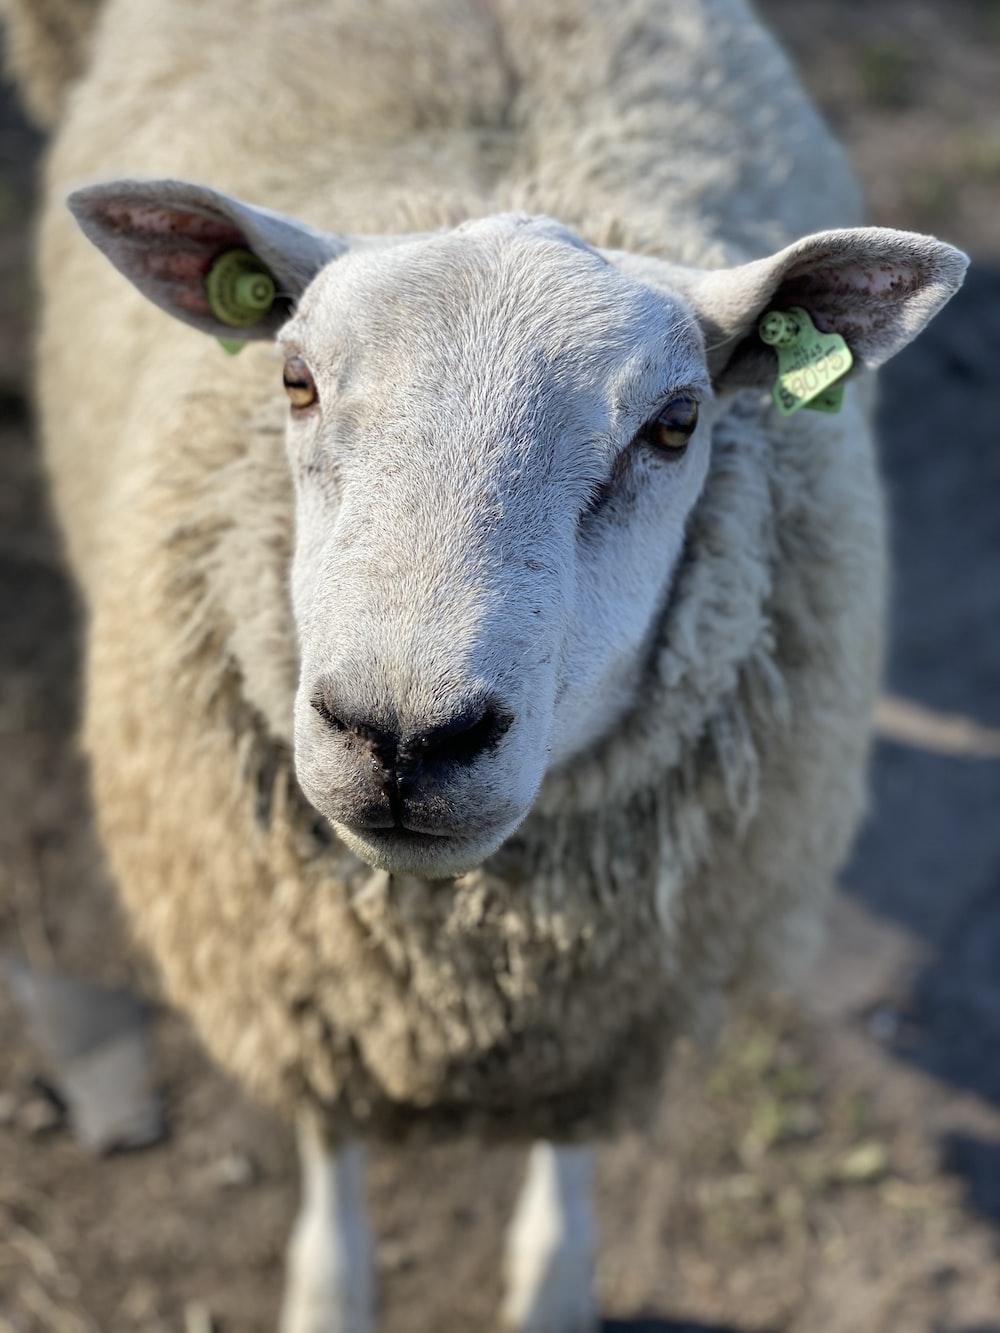 white sheep on brown dirt during daytime